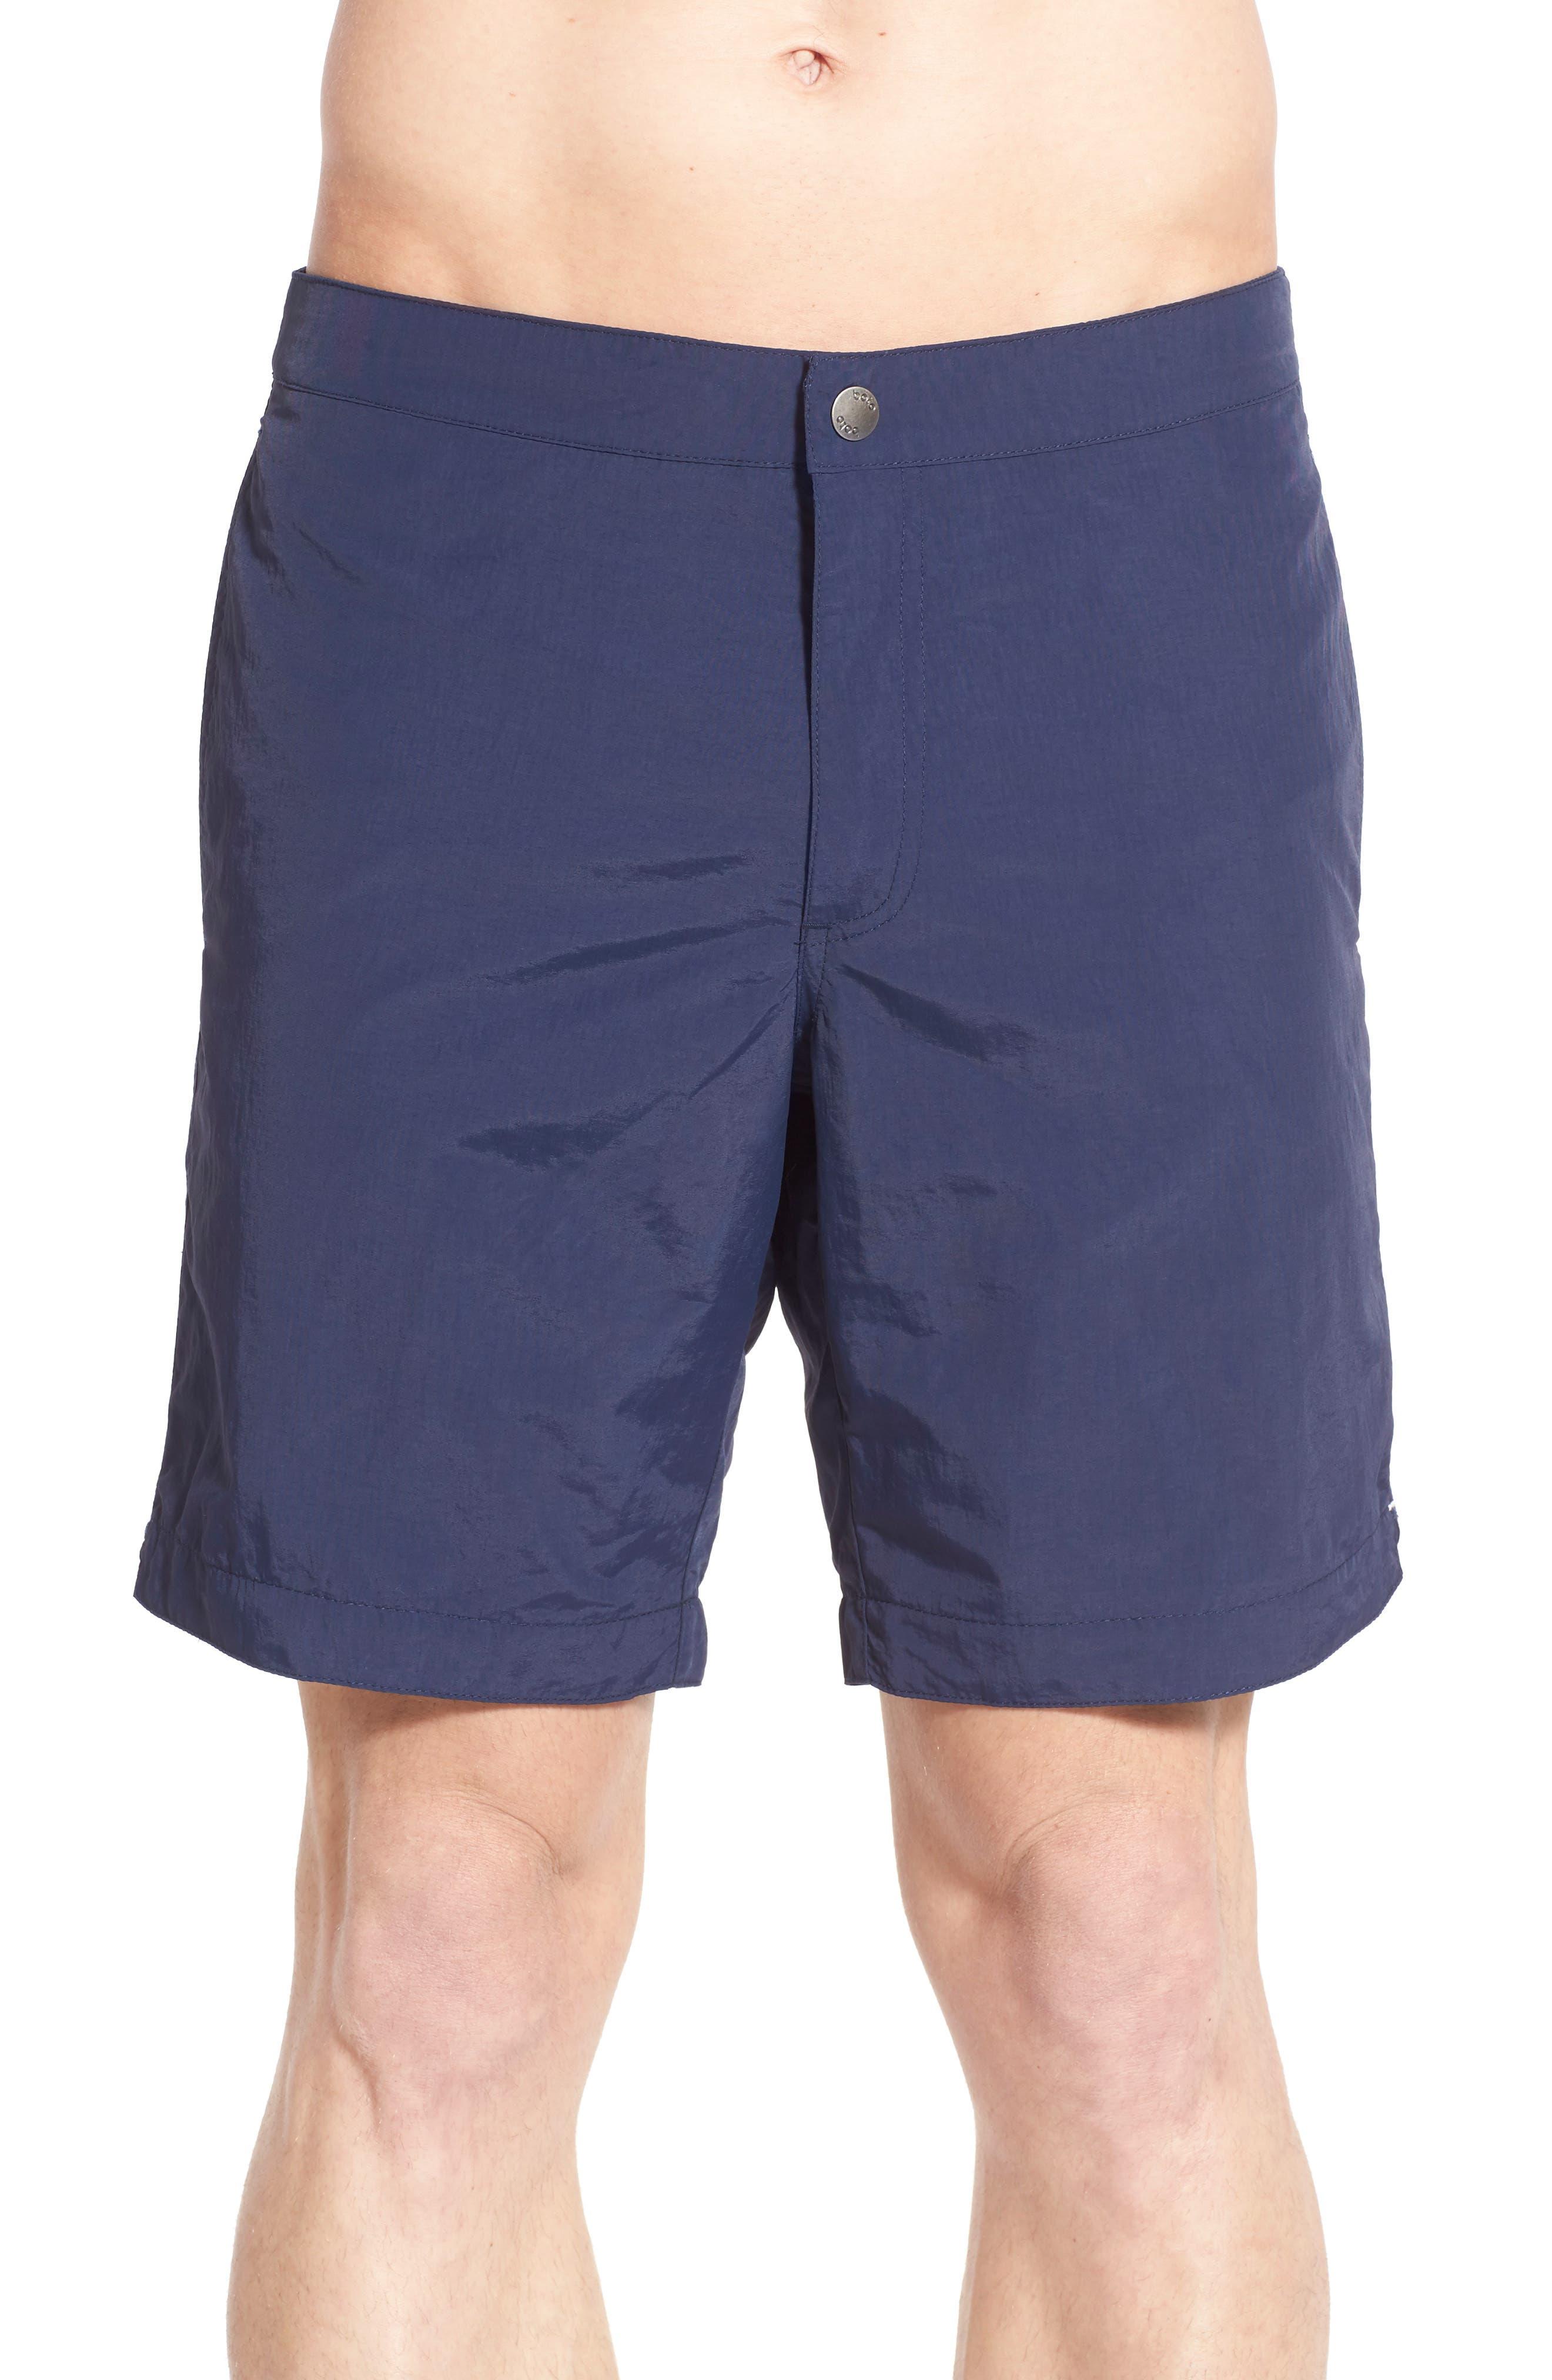 Aruba Tailored Fit 8.5 Inch Swim Trunks,                             Alternate thumbnail 2, color,                             415